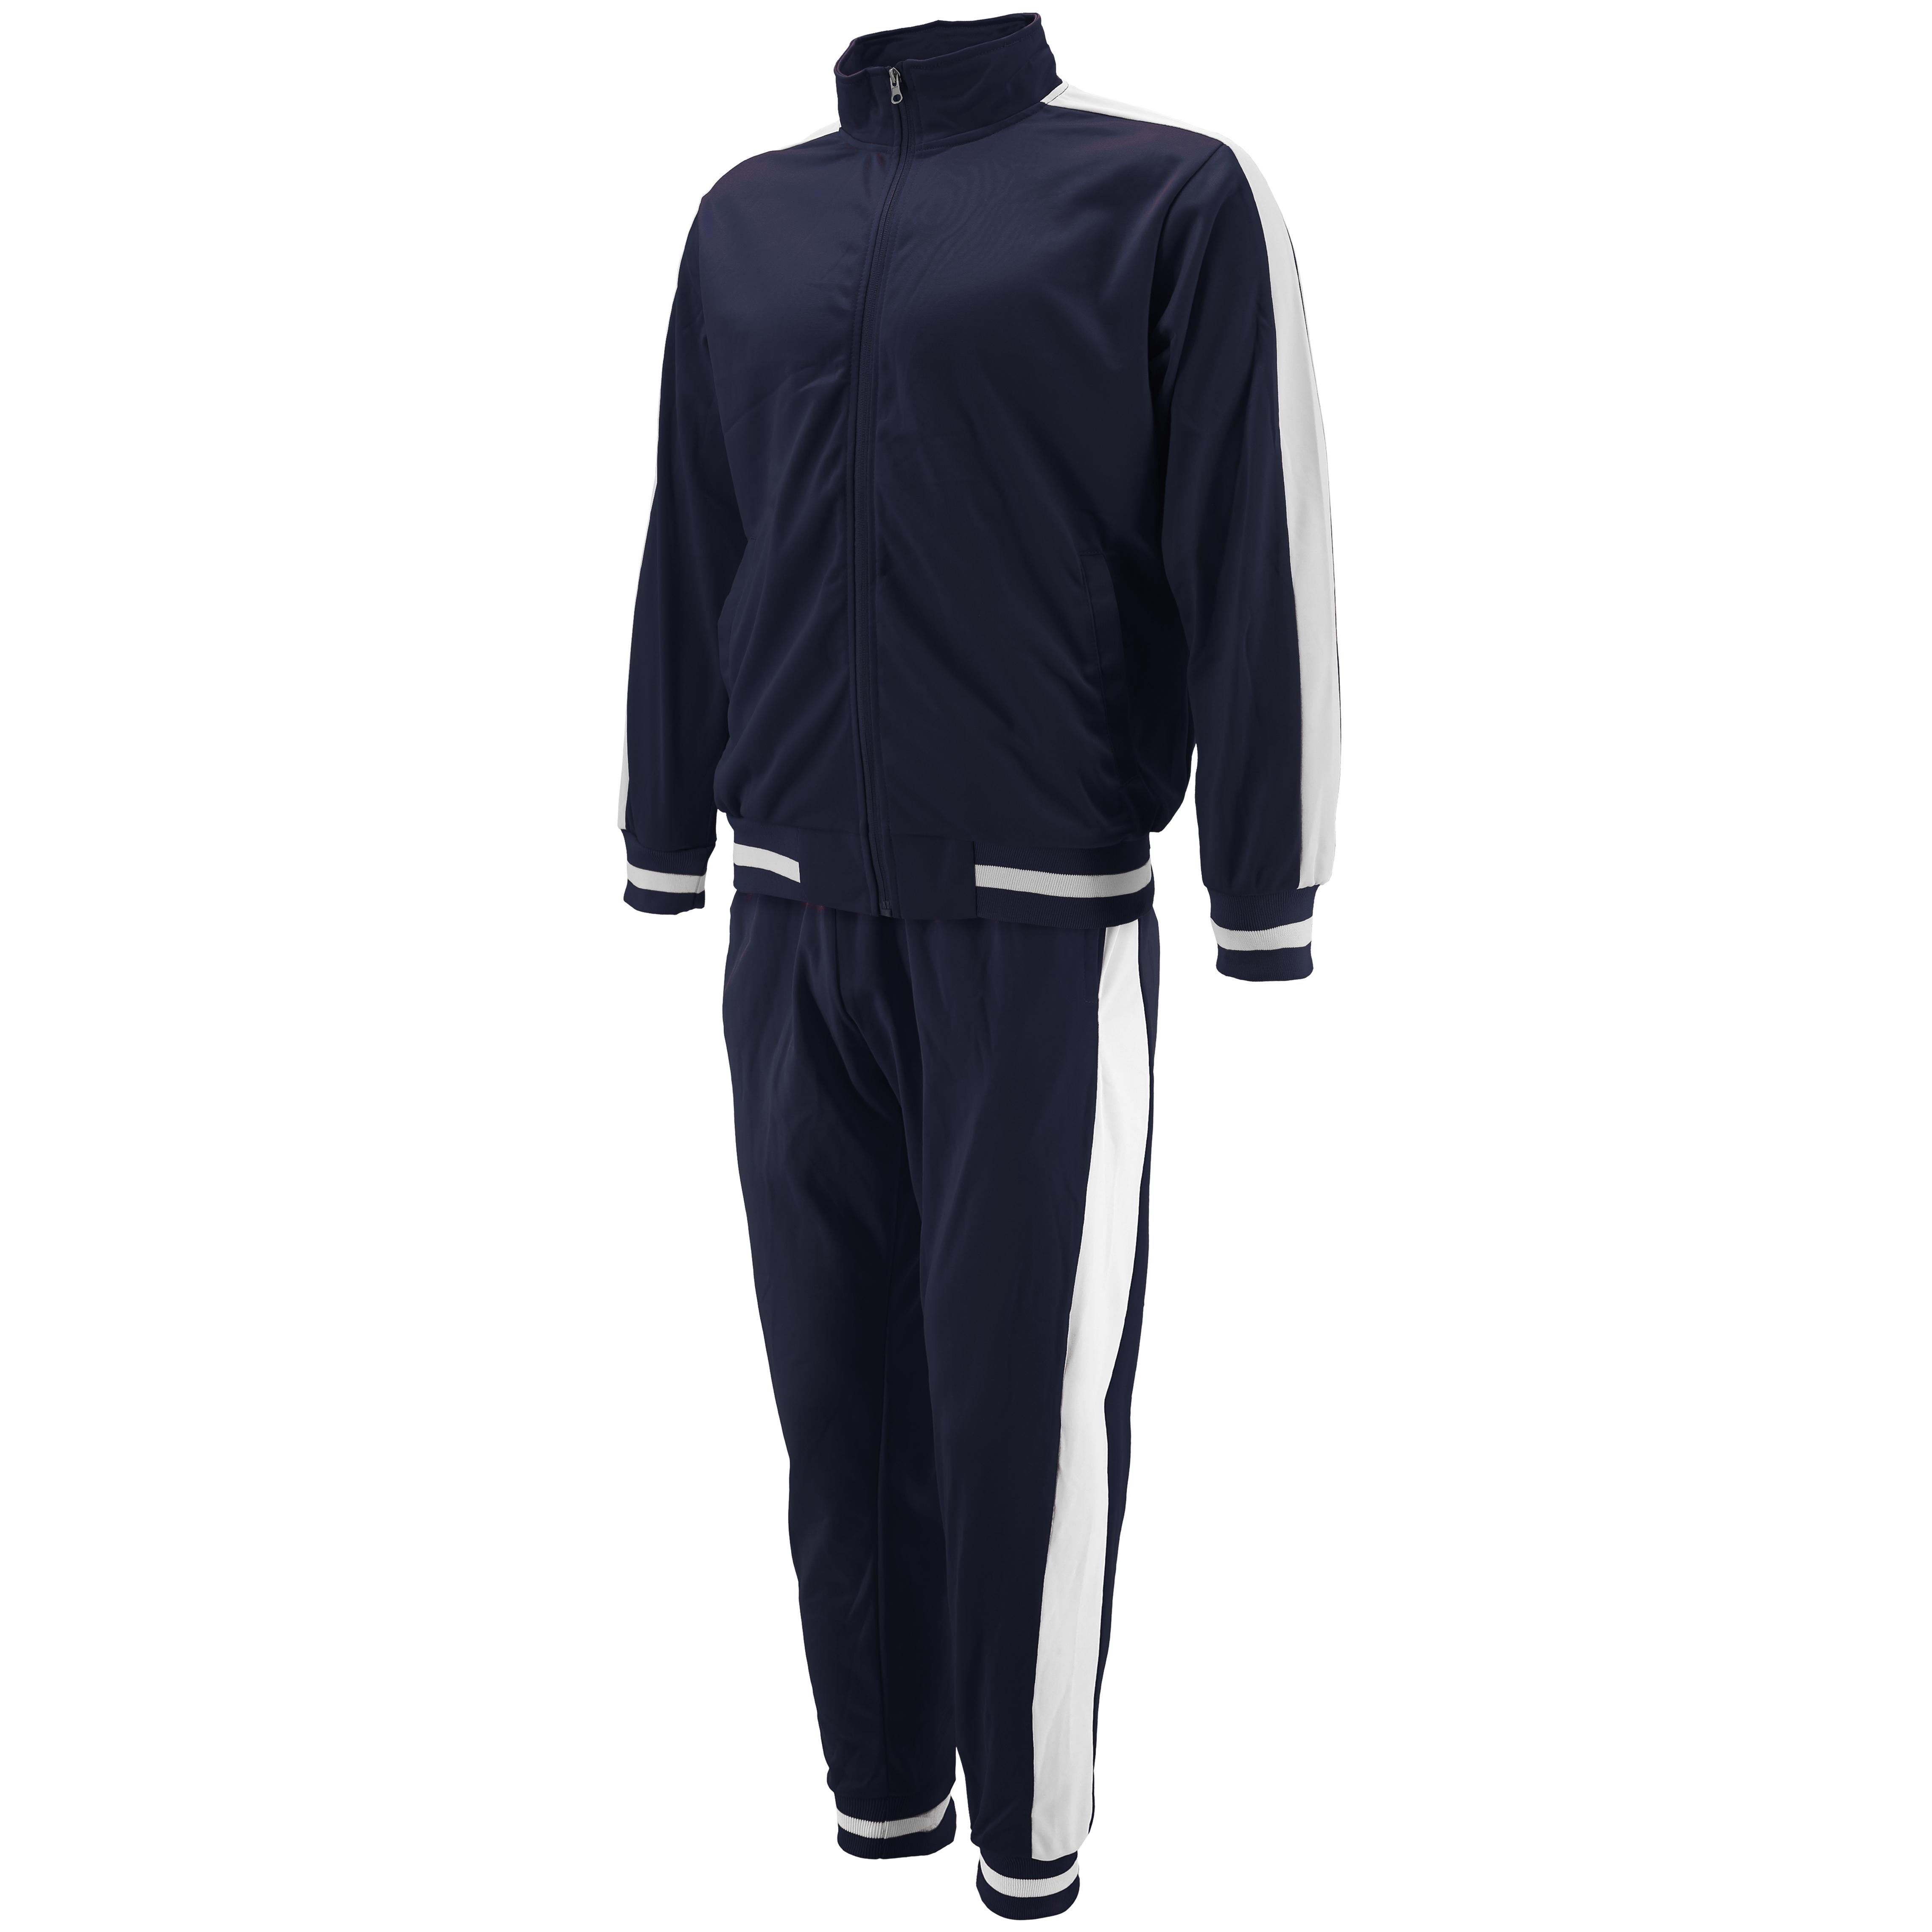 vkwear-Men-039-s-Striped-Athletic-Running-Jogging-Gym-Slim-Fit-Sweat-Track-Suit-Set